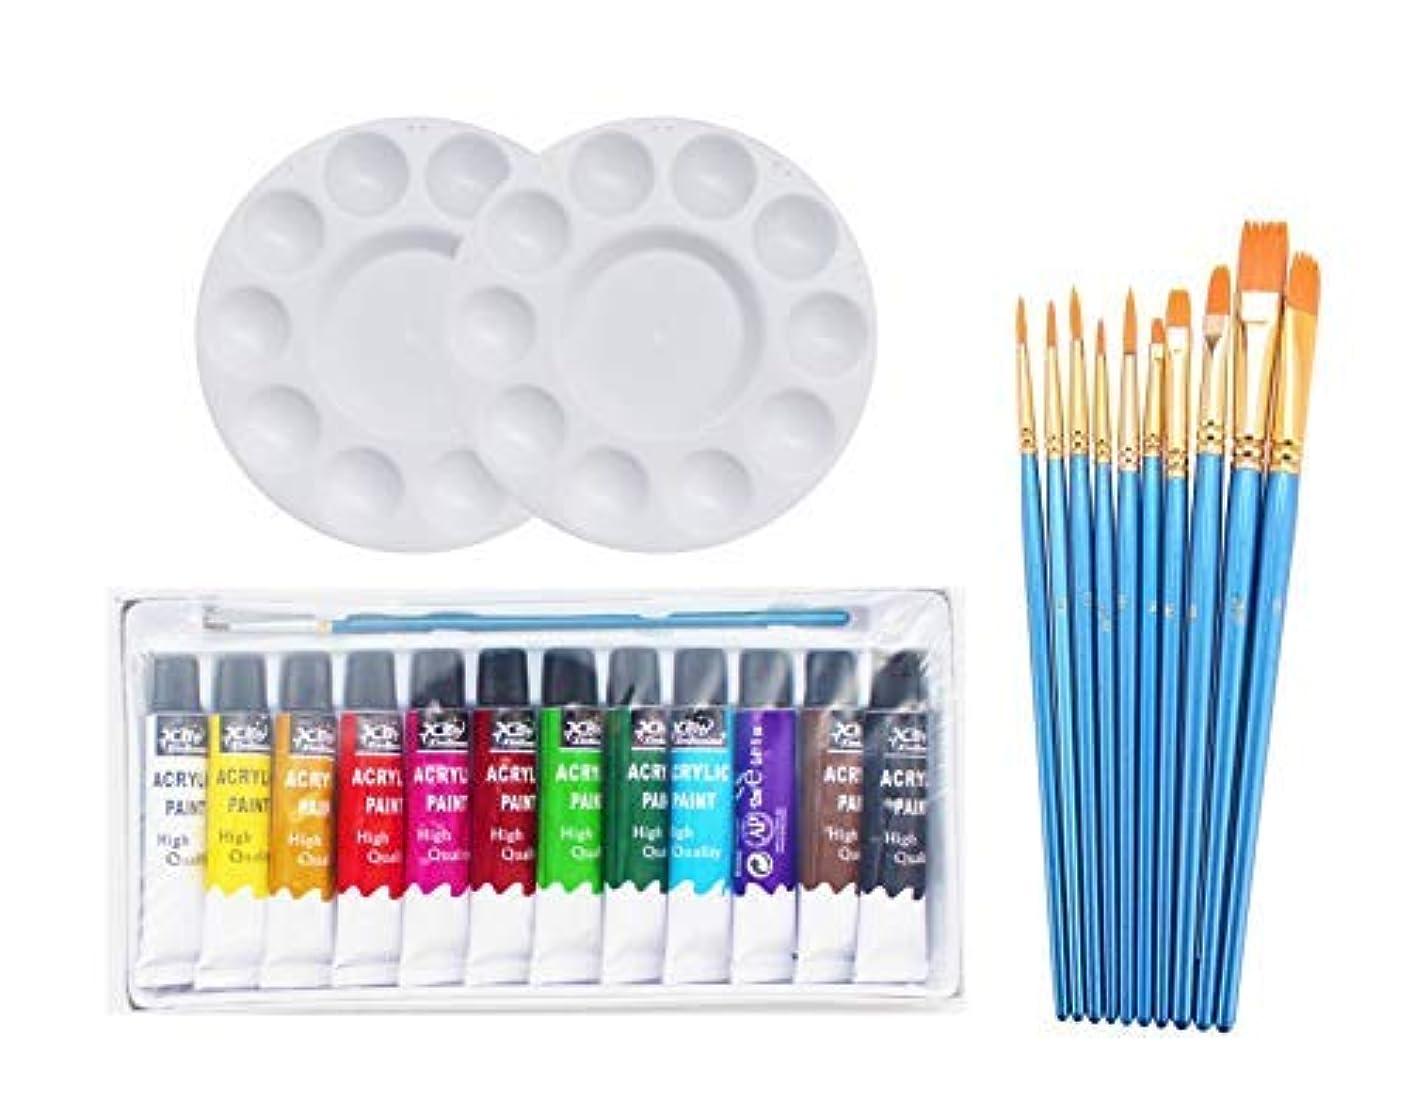 SKKSTATIONERY 24 Pack Acrylic Paint Set, 10 Paint Brushes & 2 Palette & 12 Colors Acrylic Paint.